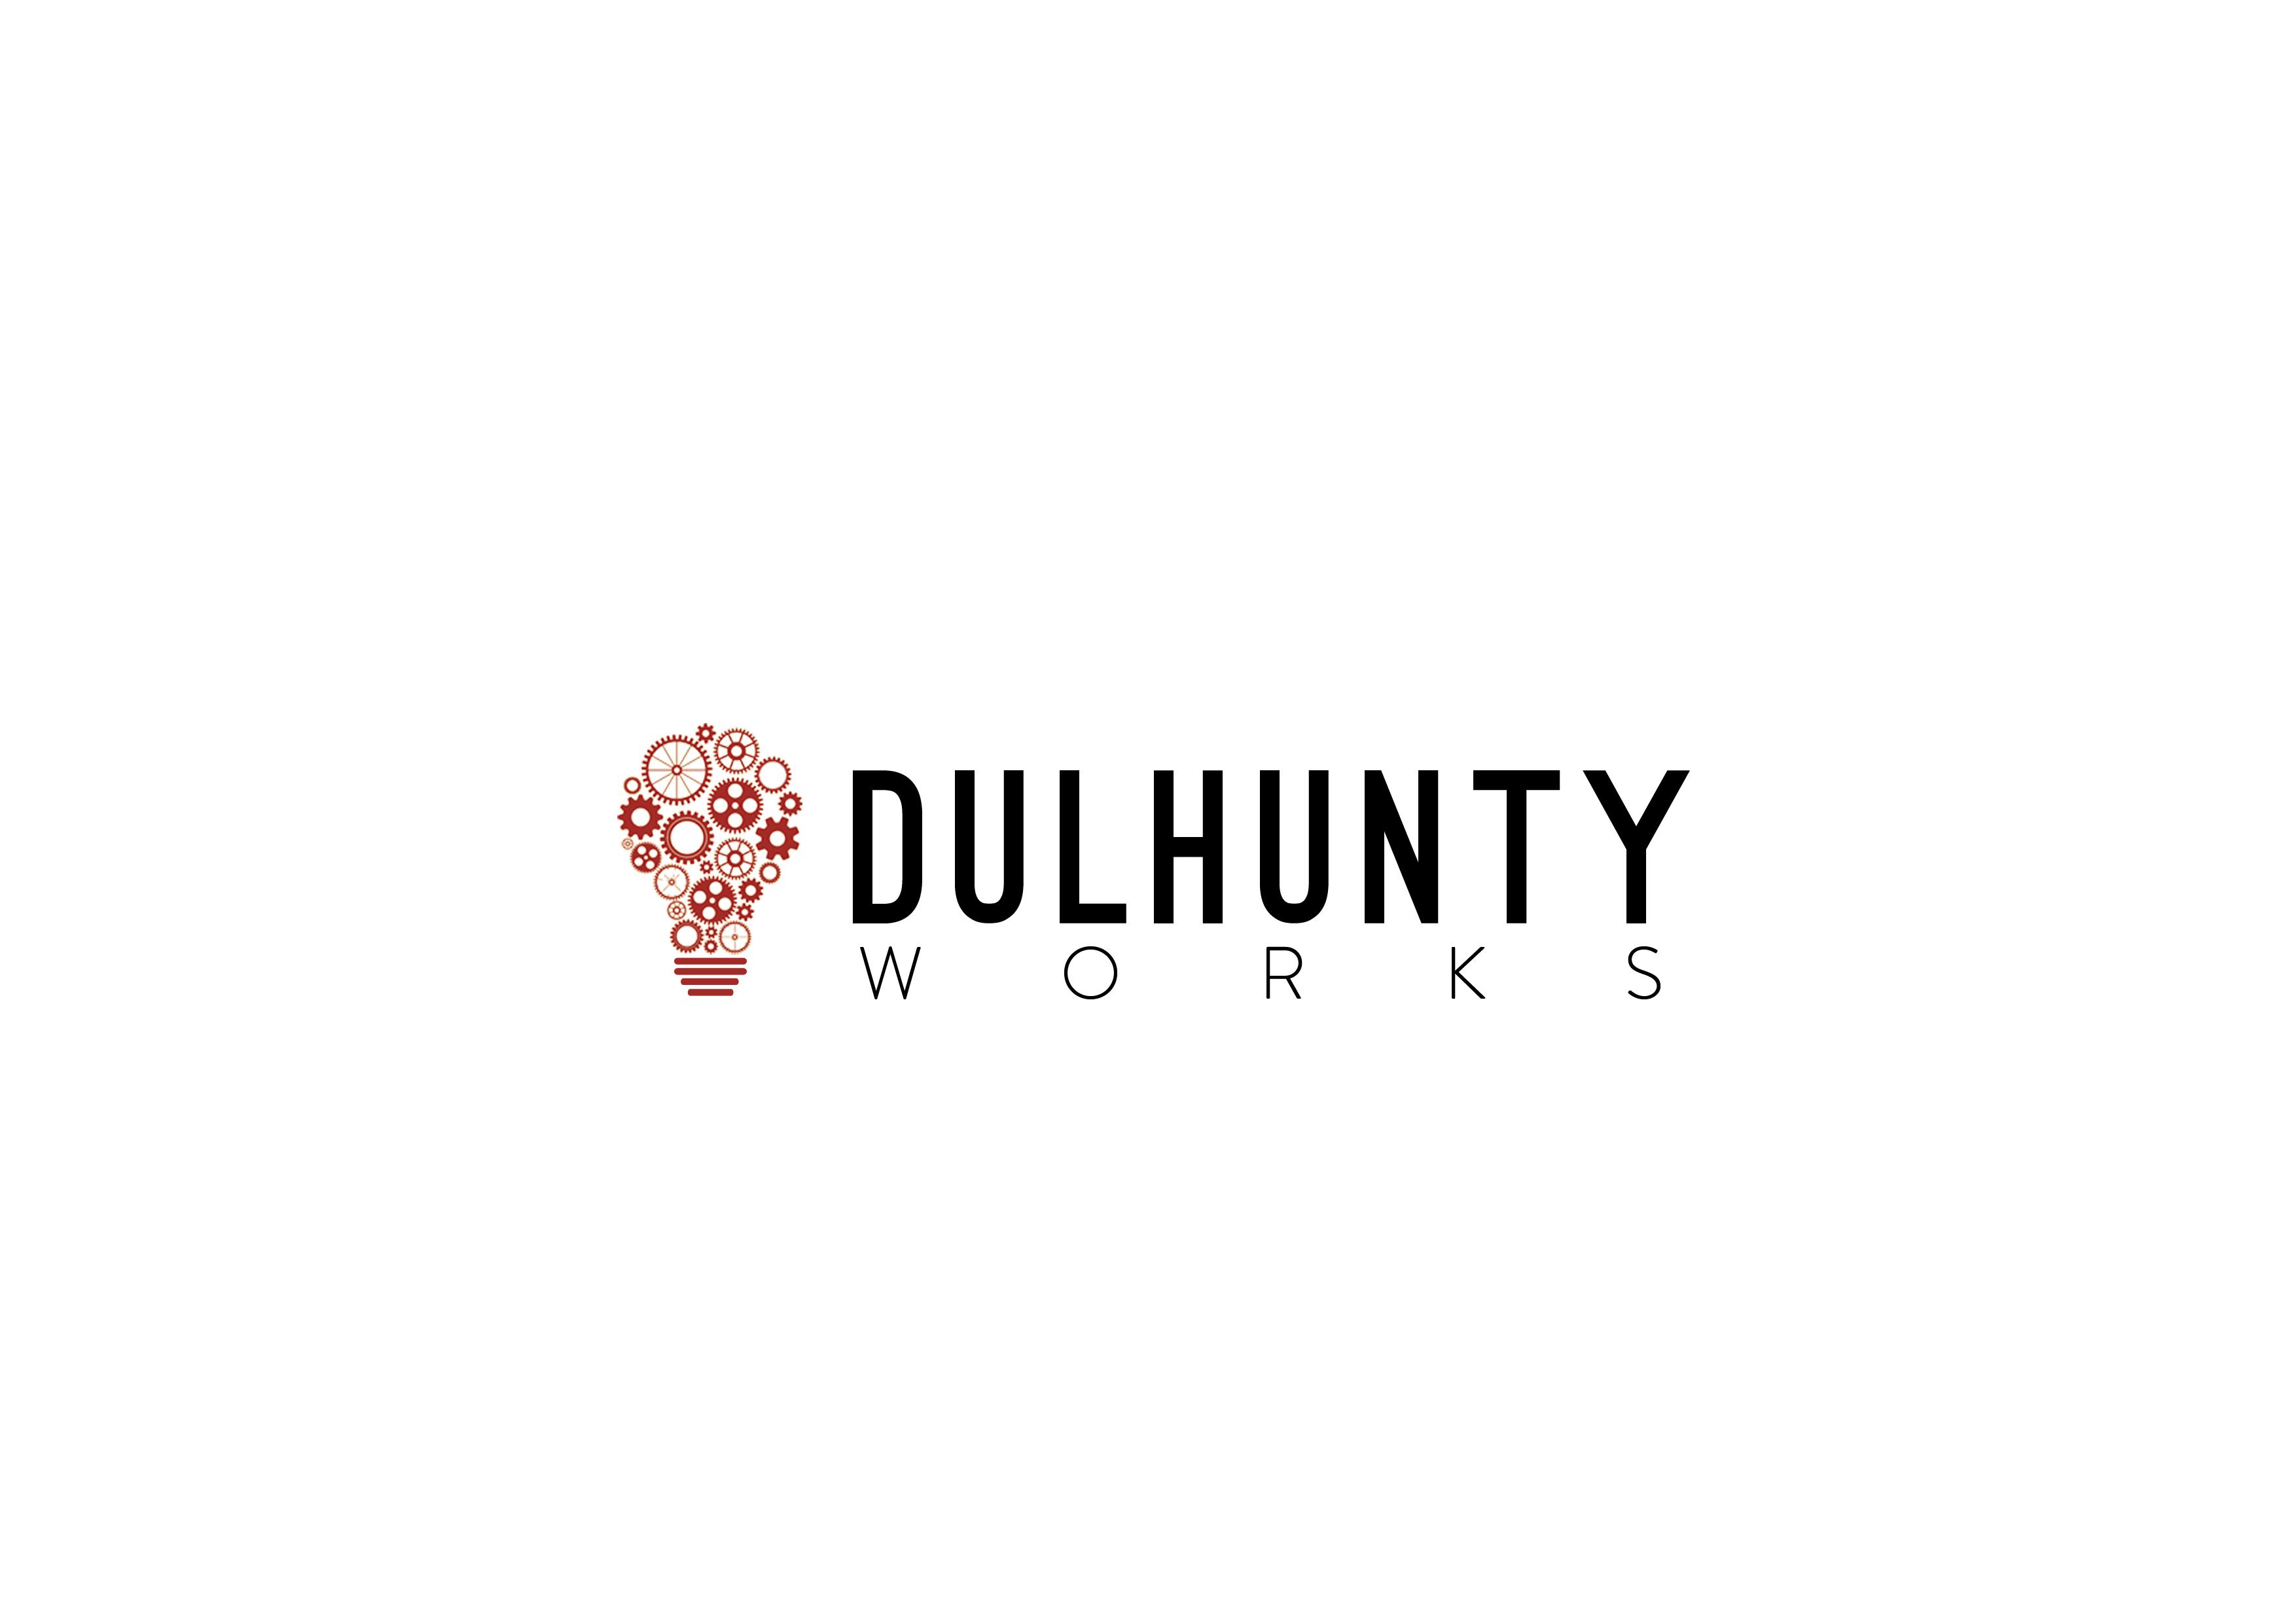 Dulhunty_Works_V3.jpg